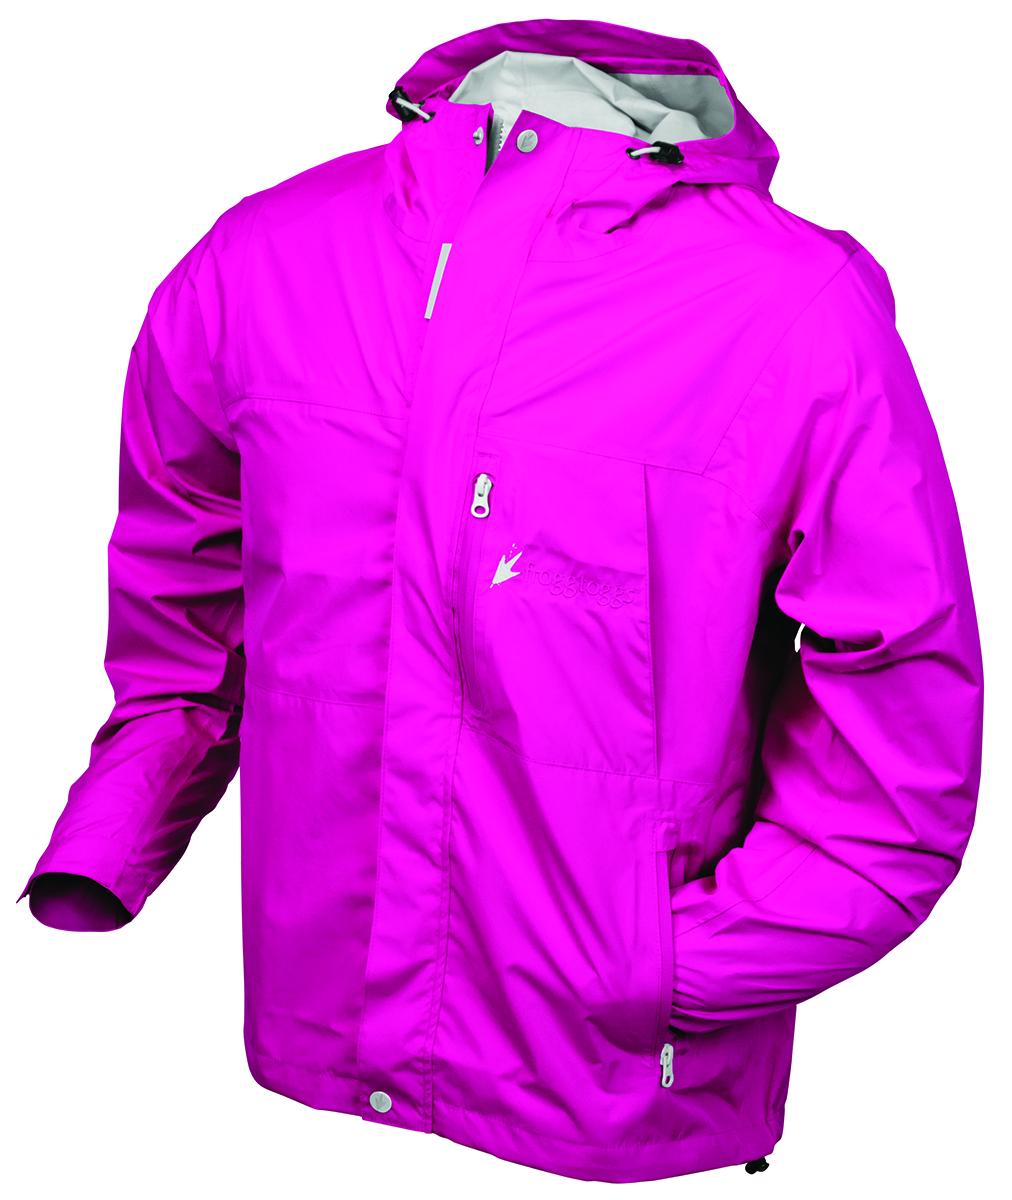 Frogg Toggs Women S Java Toadz Rain Jacket Pink Sm Ebay